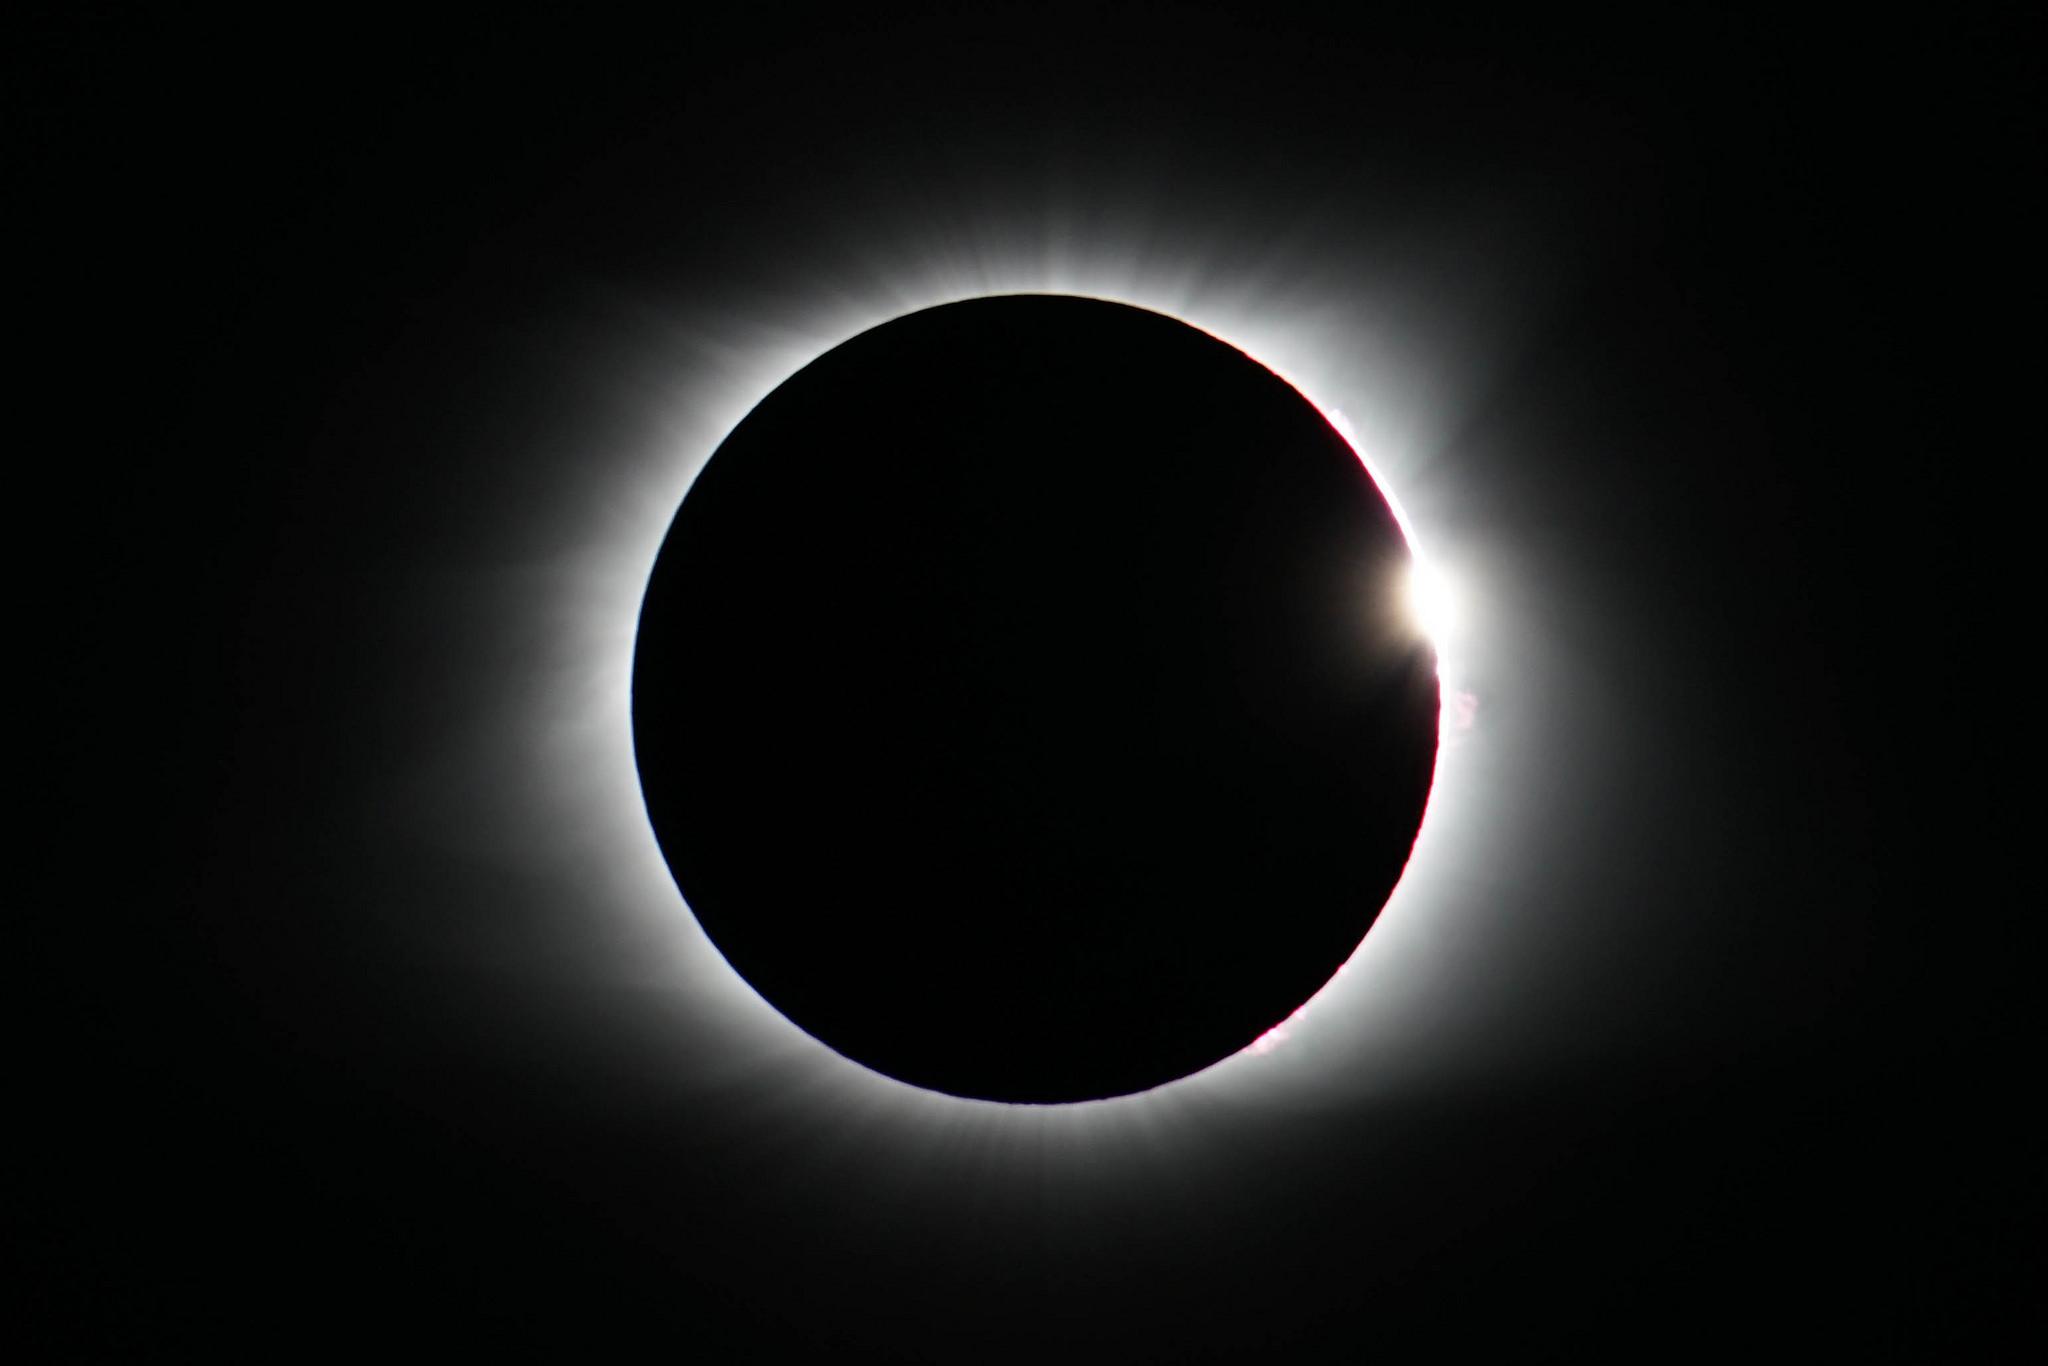 Eclipse by Andrew Hancox.